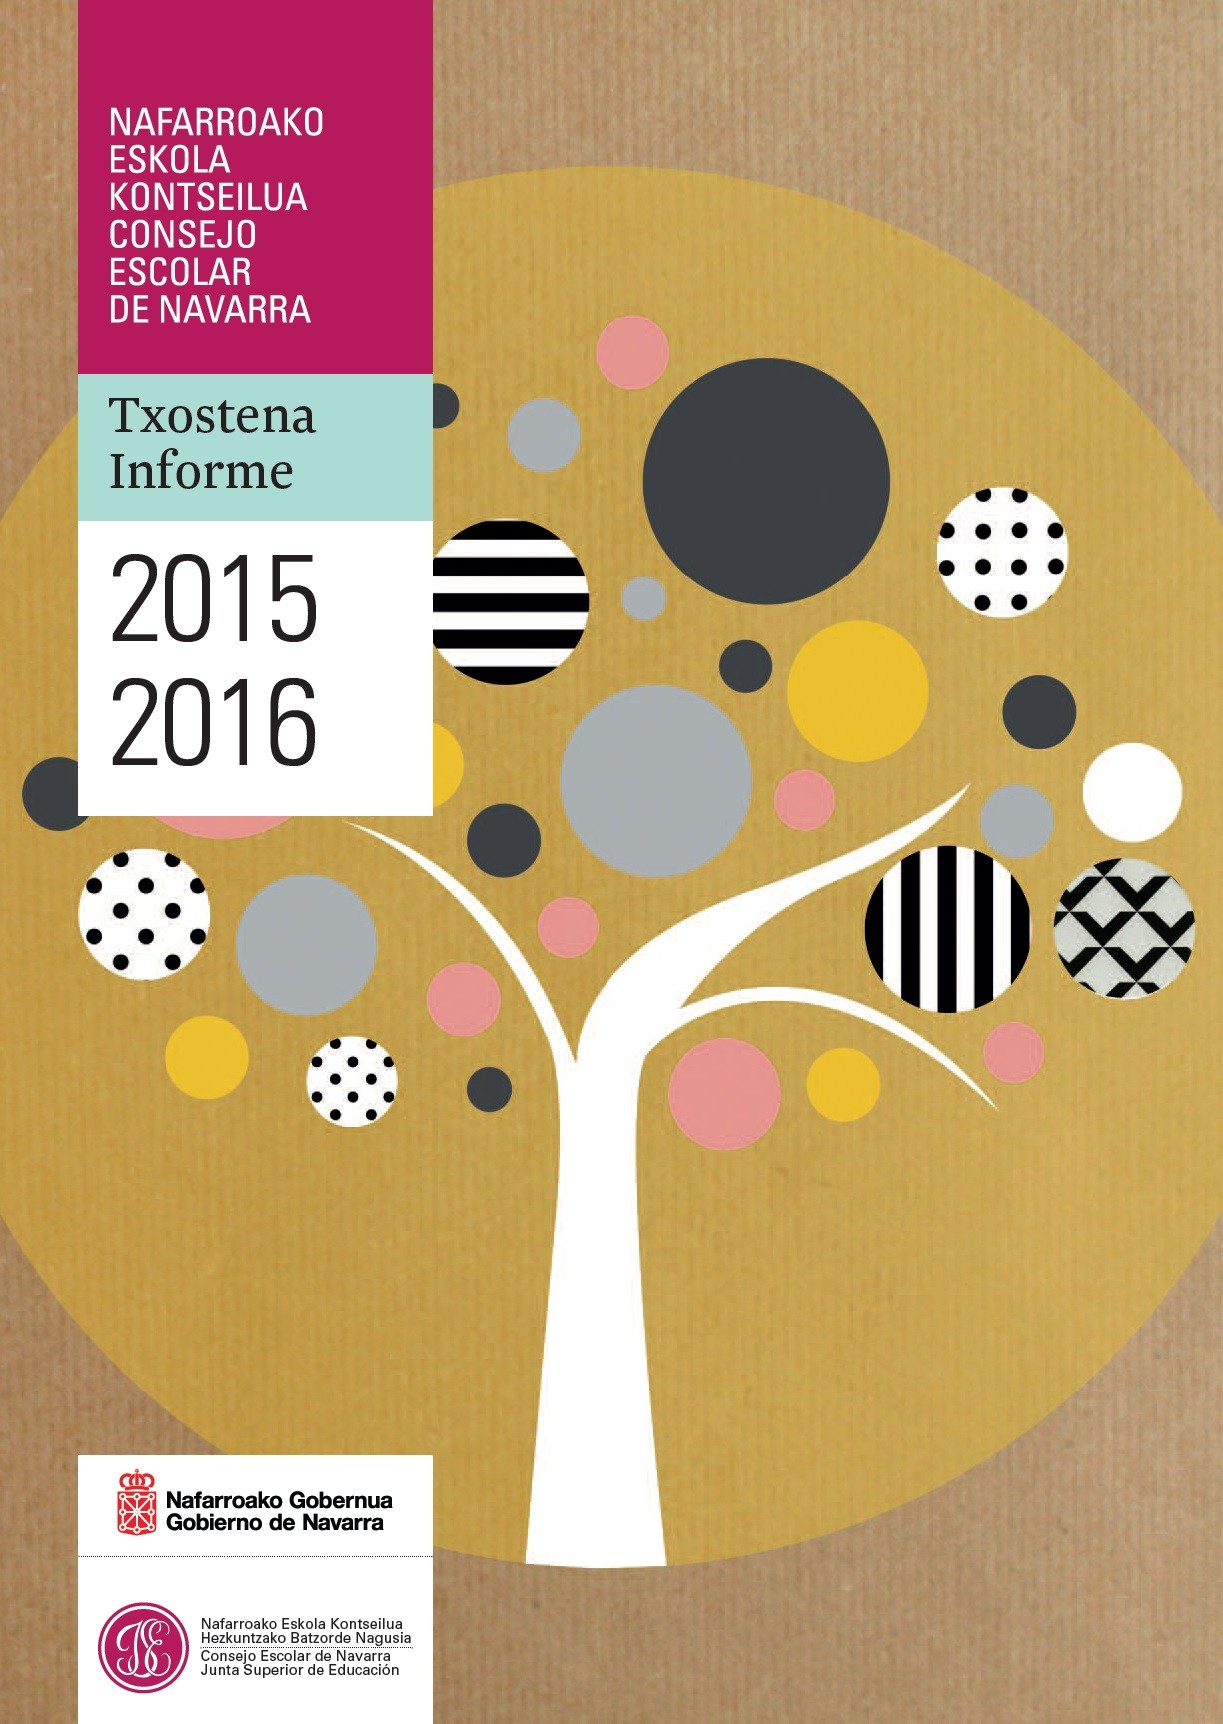 Calendario 2019 Escolar Aragon Más Recientes Captulo 1 22 12 Of Calendario 2019 Escolar Aragon Más Recientemente Liberado I E S Virgen Del Pilar